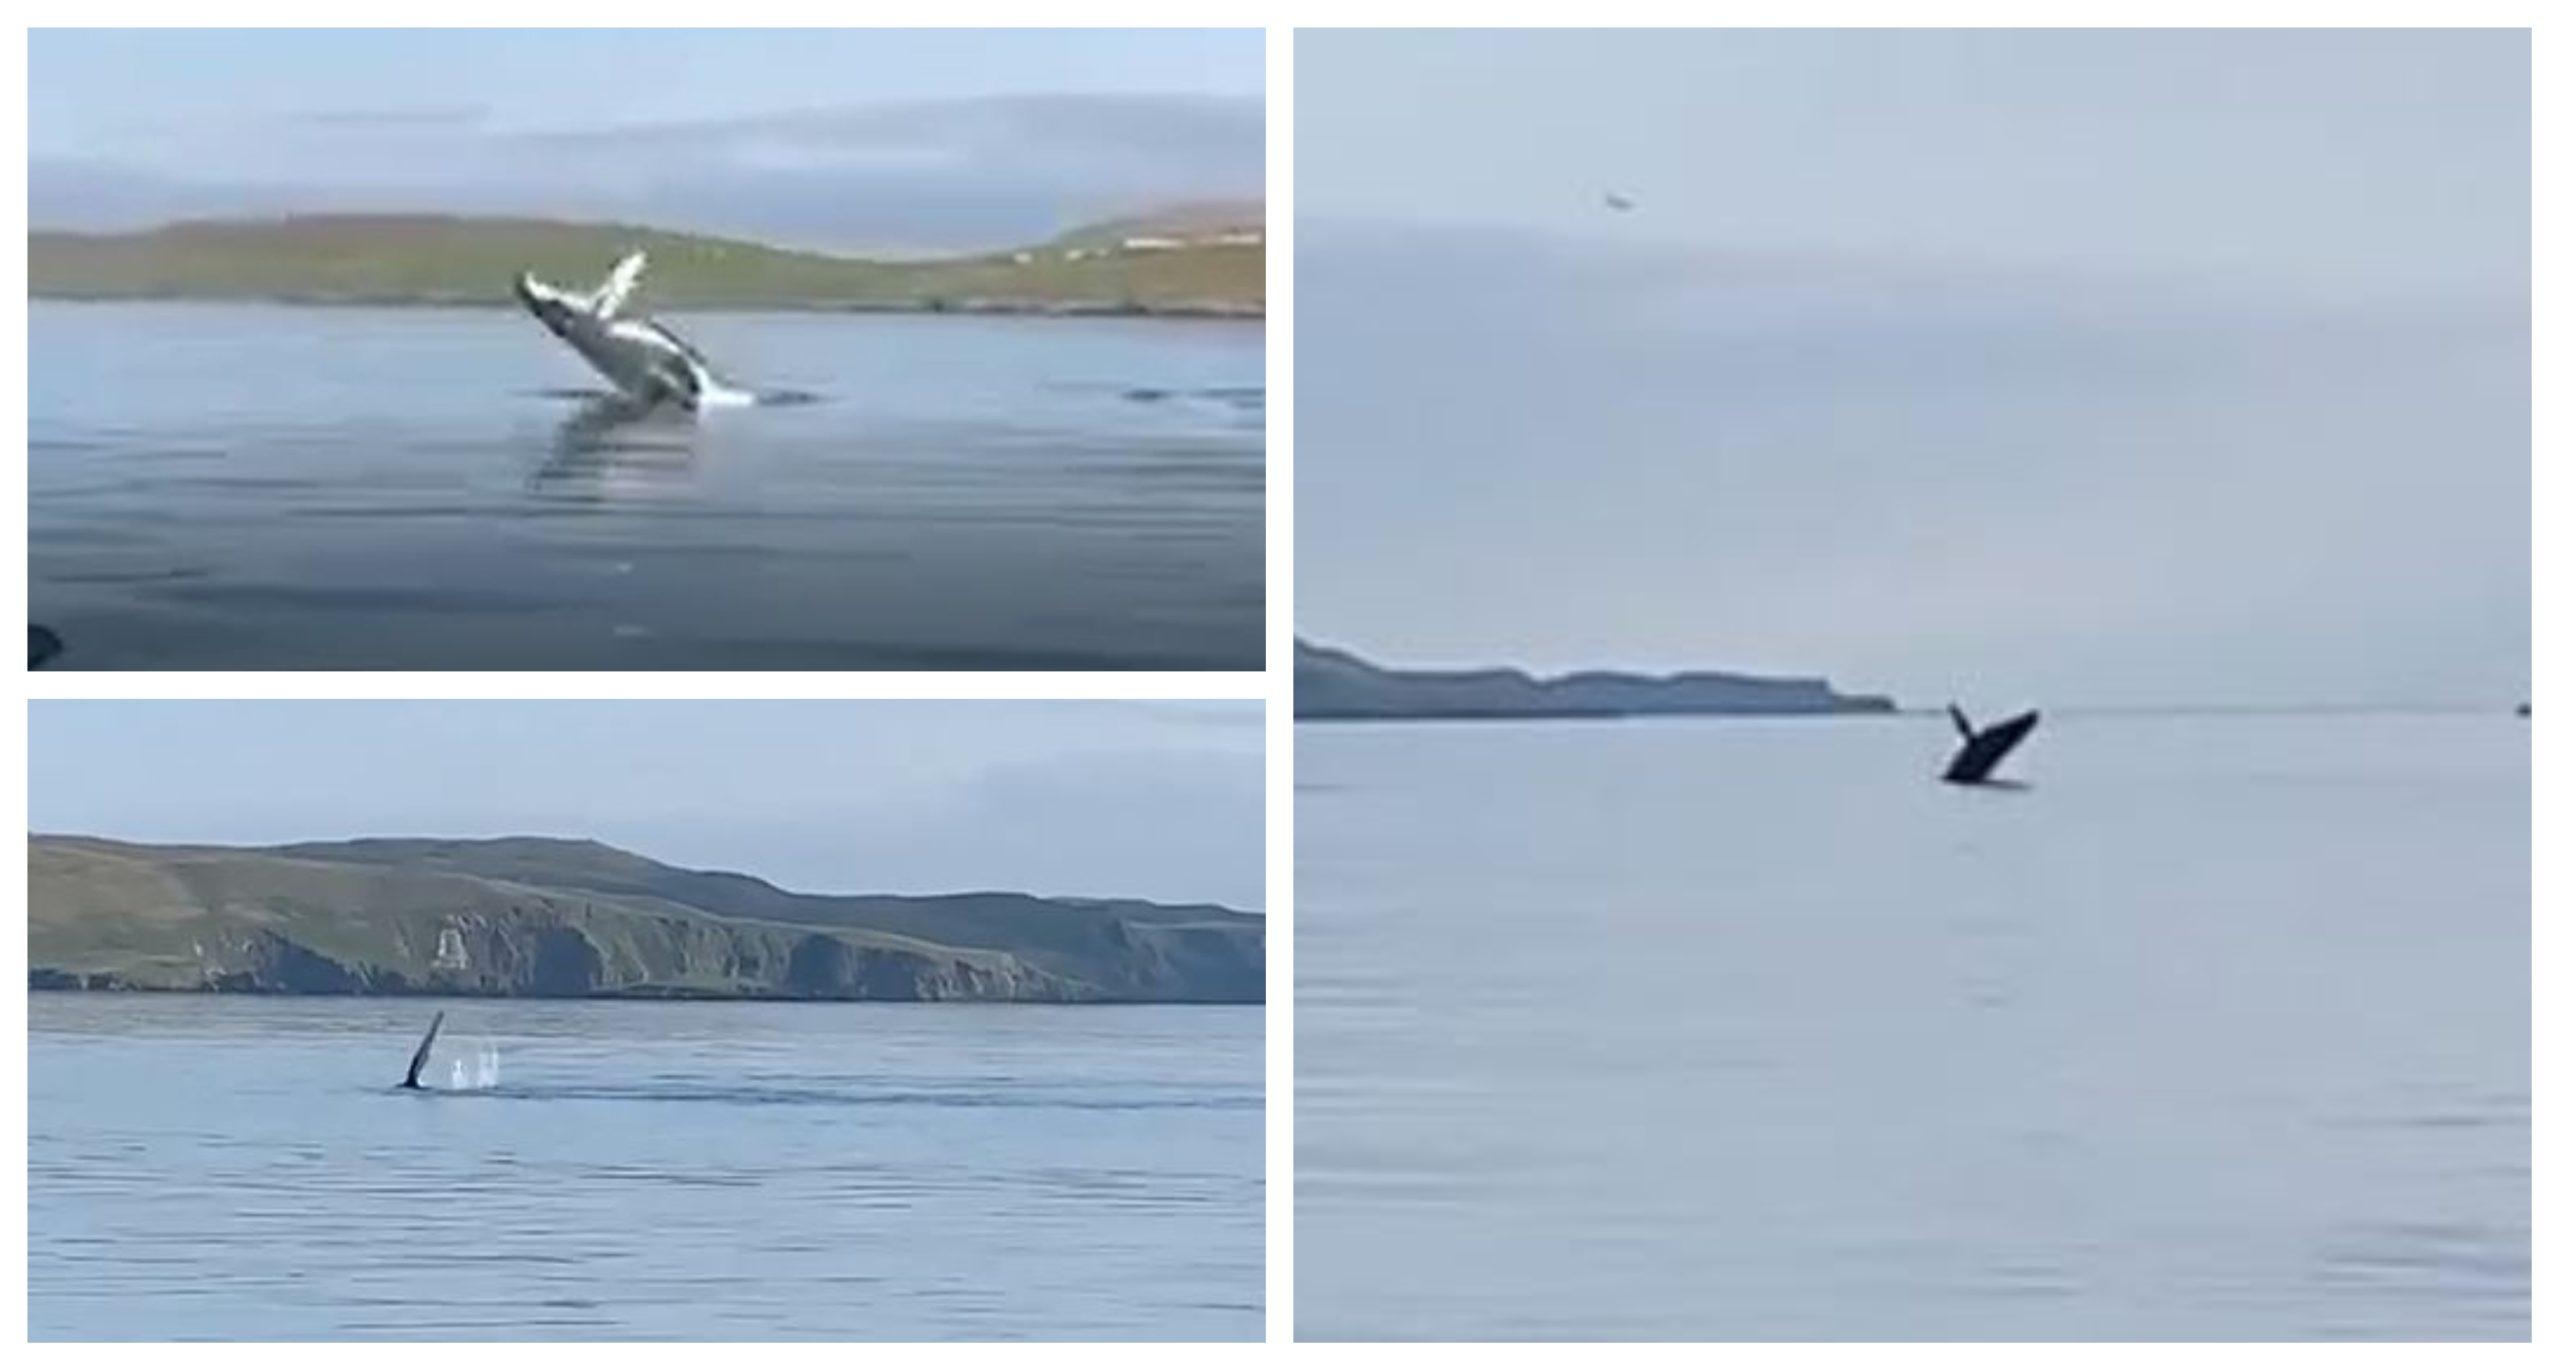 Screenshots of the humpback whale spotted near Shetland.